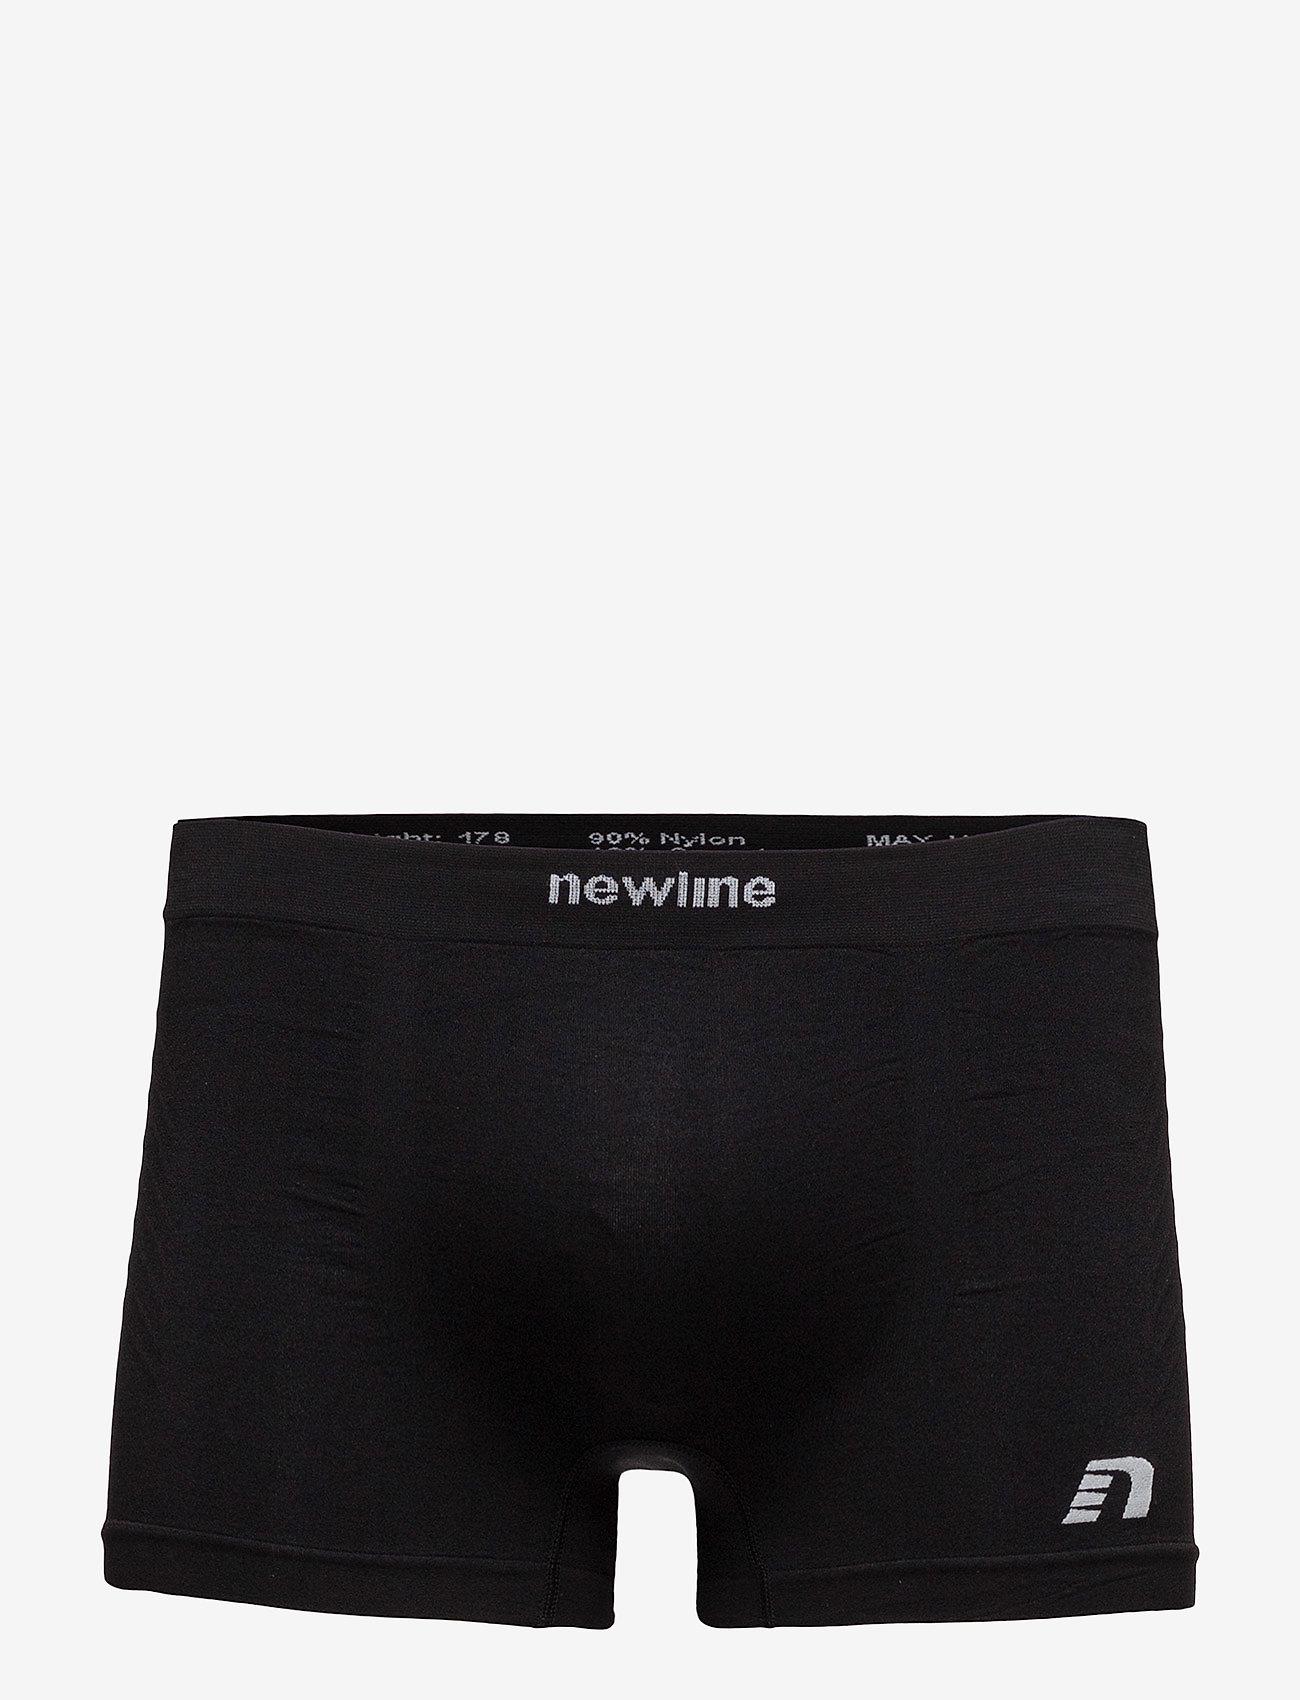 Newline - BOXER - bokseršorti - black - 0